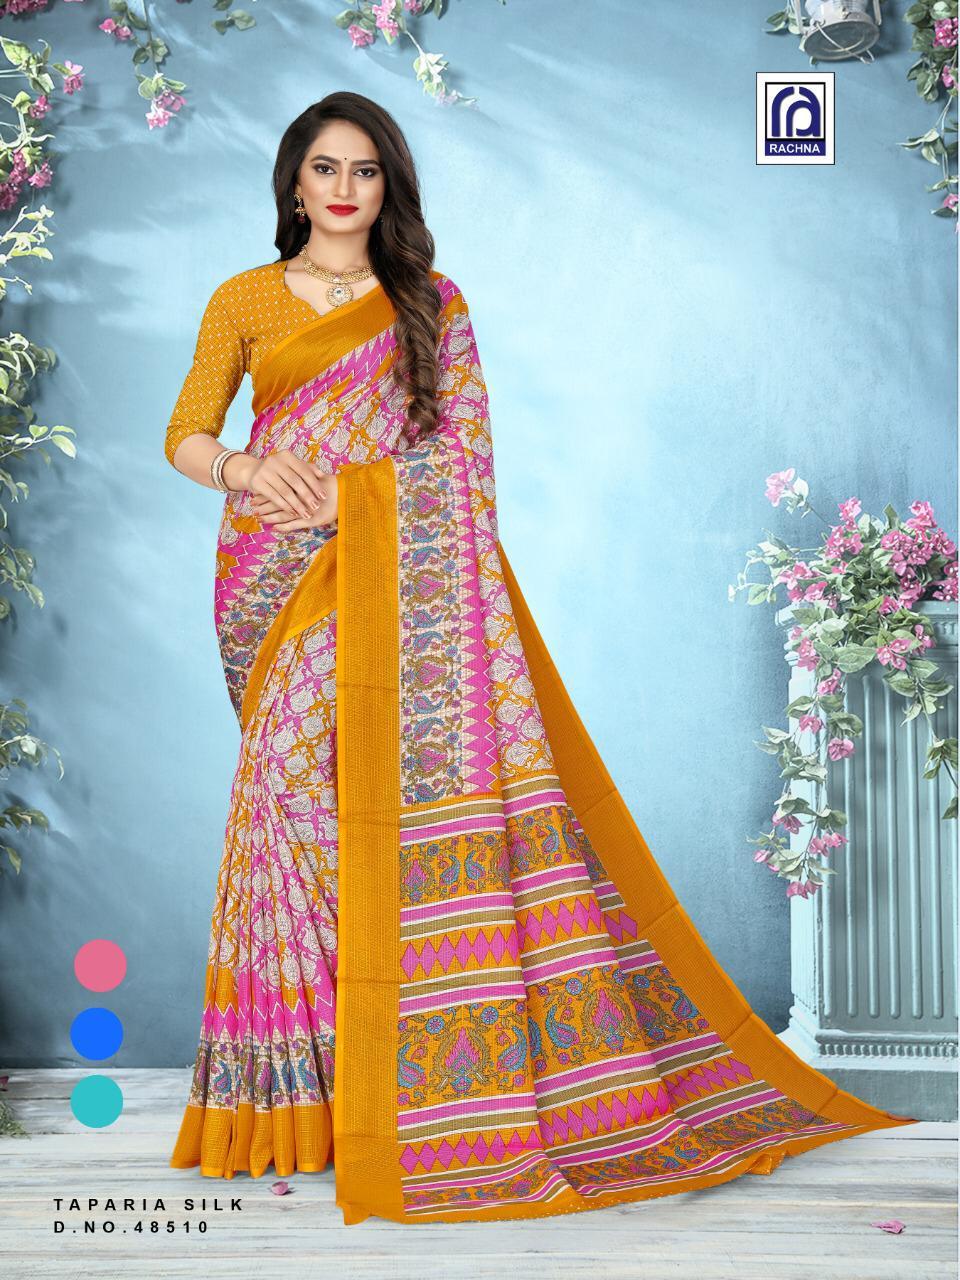 Rachna Present Taparia Silk 48501 Series Cotton Silk Fancy Sarees